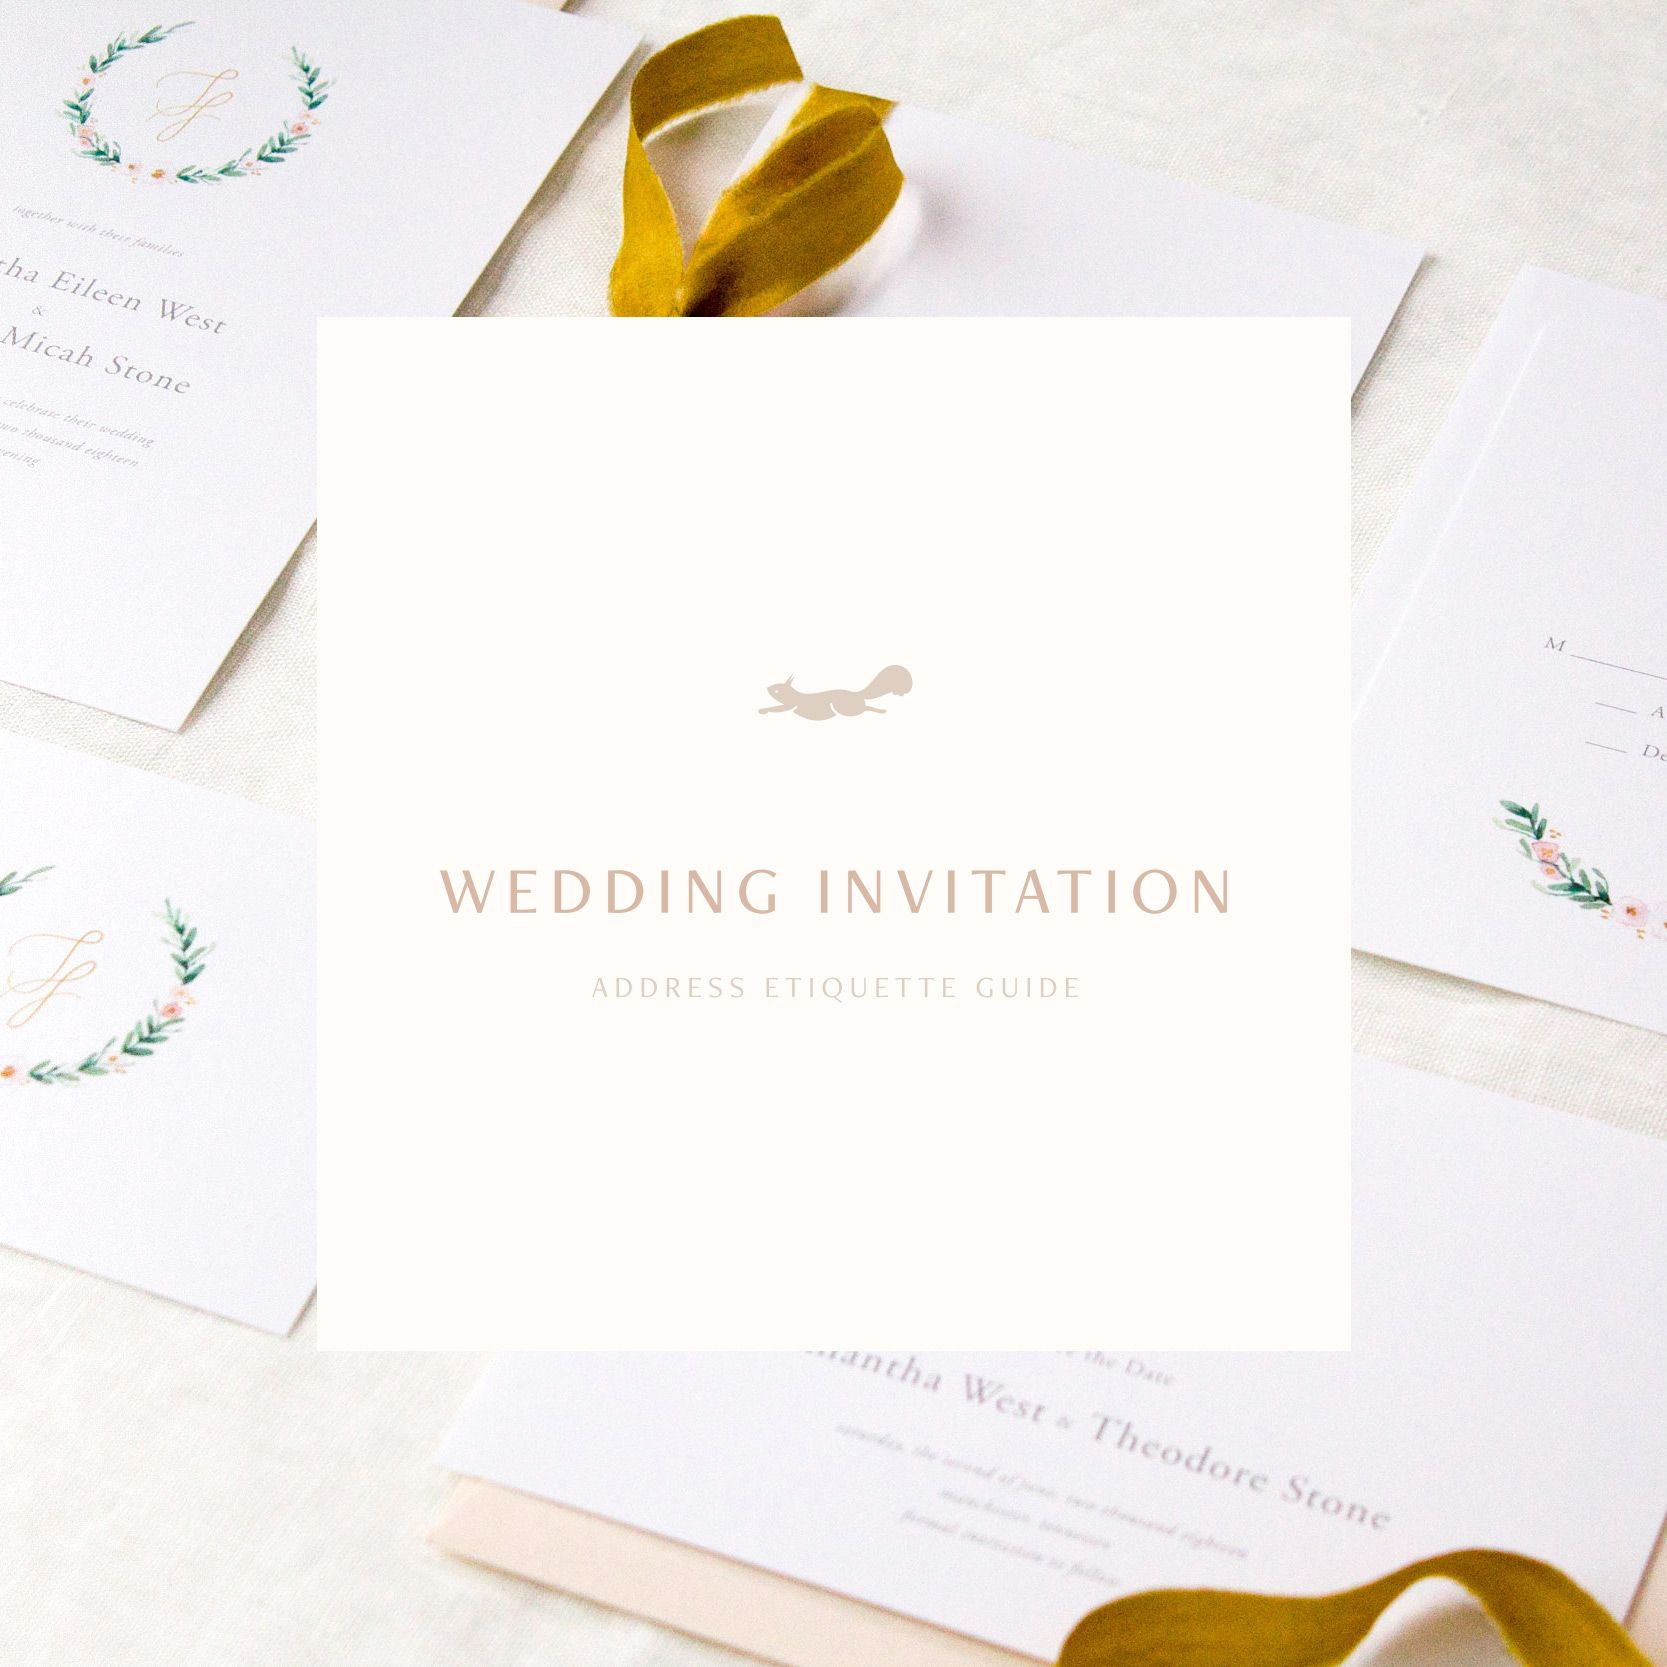 FREE Wedding Invitation Address Etiquette Guide | Download Freebie ...